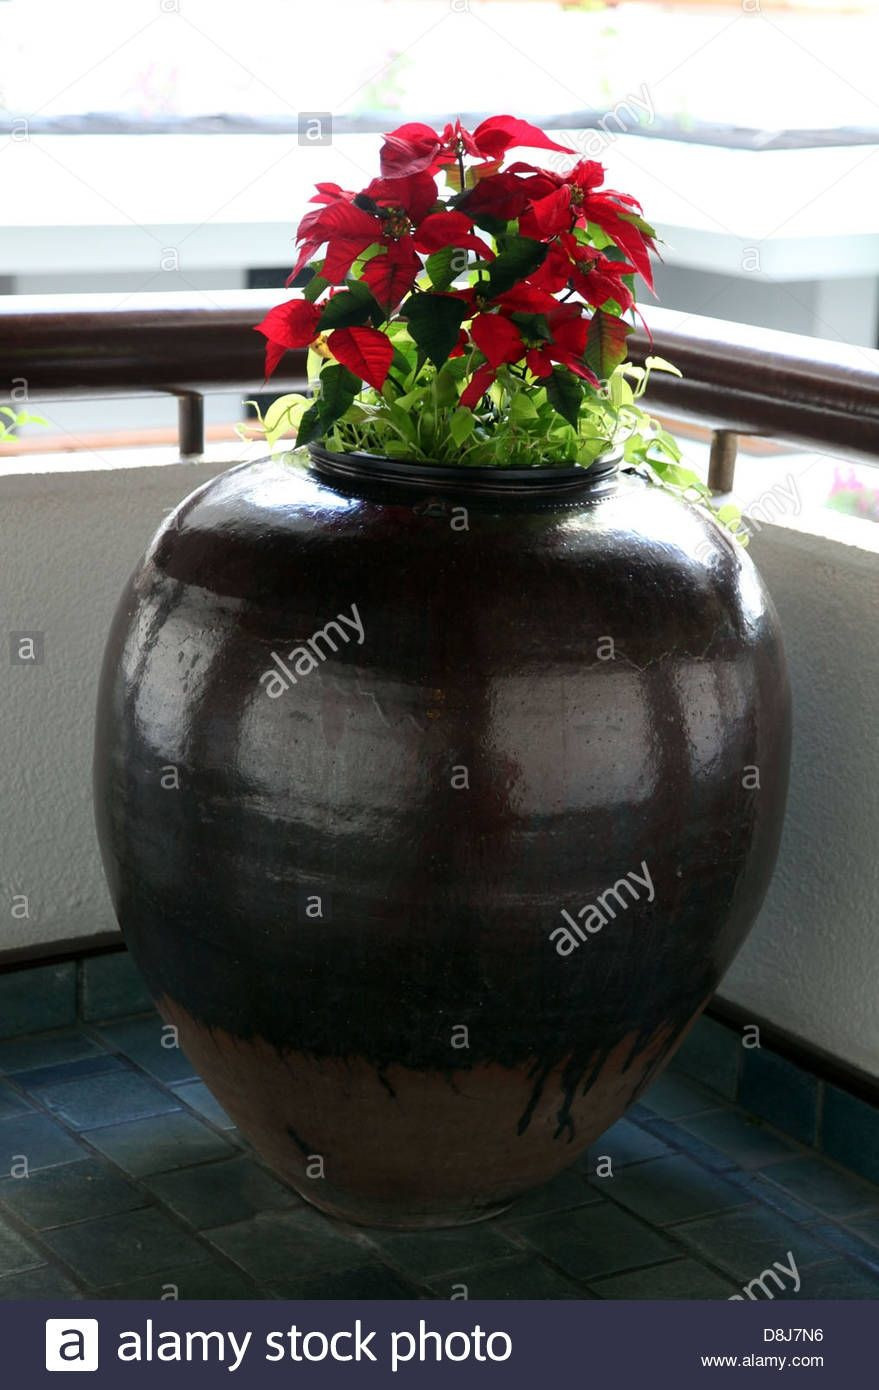 huge flower vase of wide glass vase image paint a picture luxury h vases paint vase i 0d in wide glass vase pictures corner big flower vase vase pinterest of wide glass vase image paint